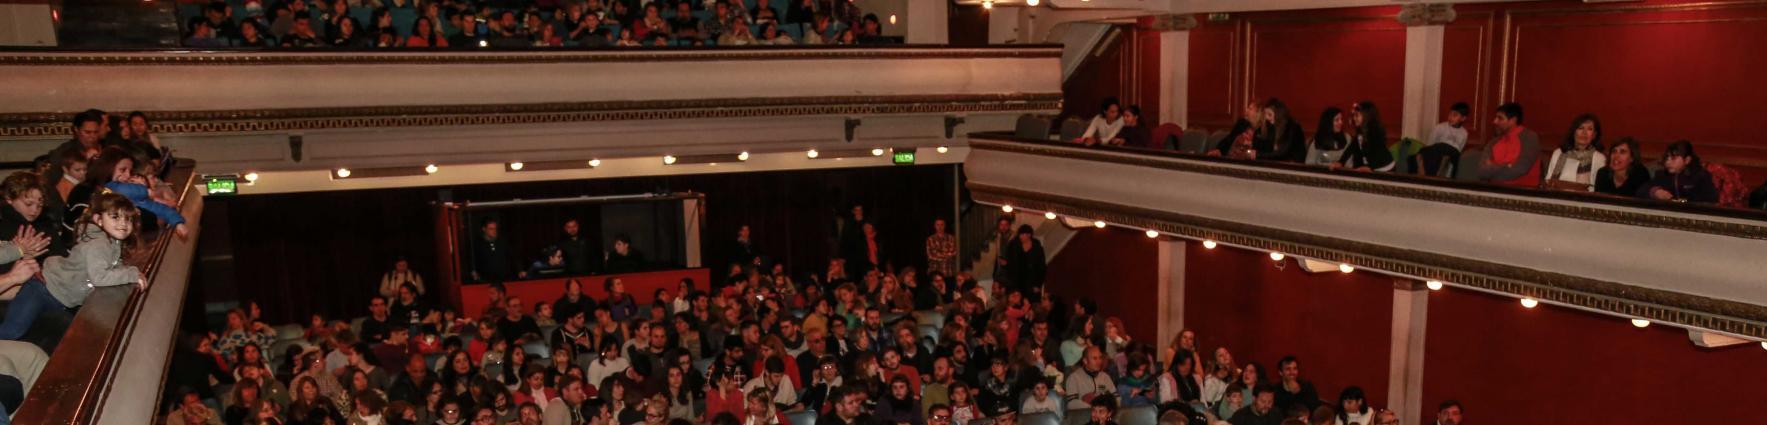 Público Teatro La Comedia